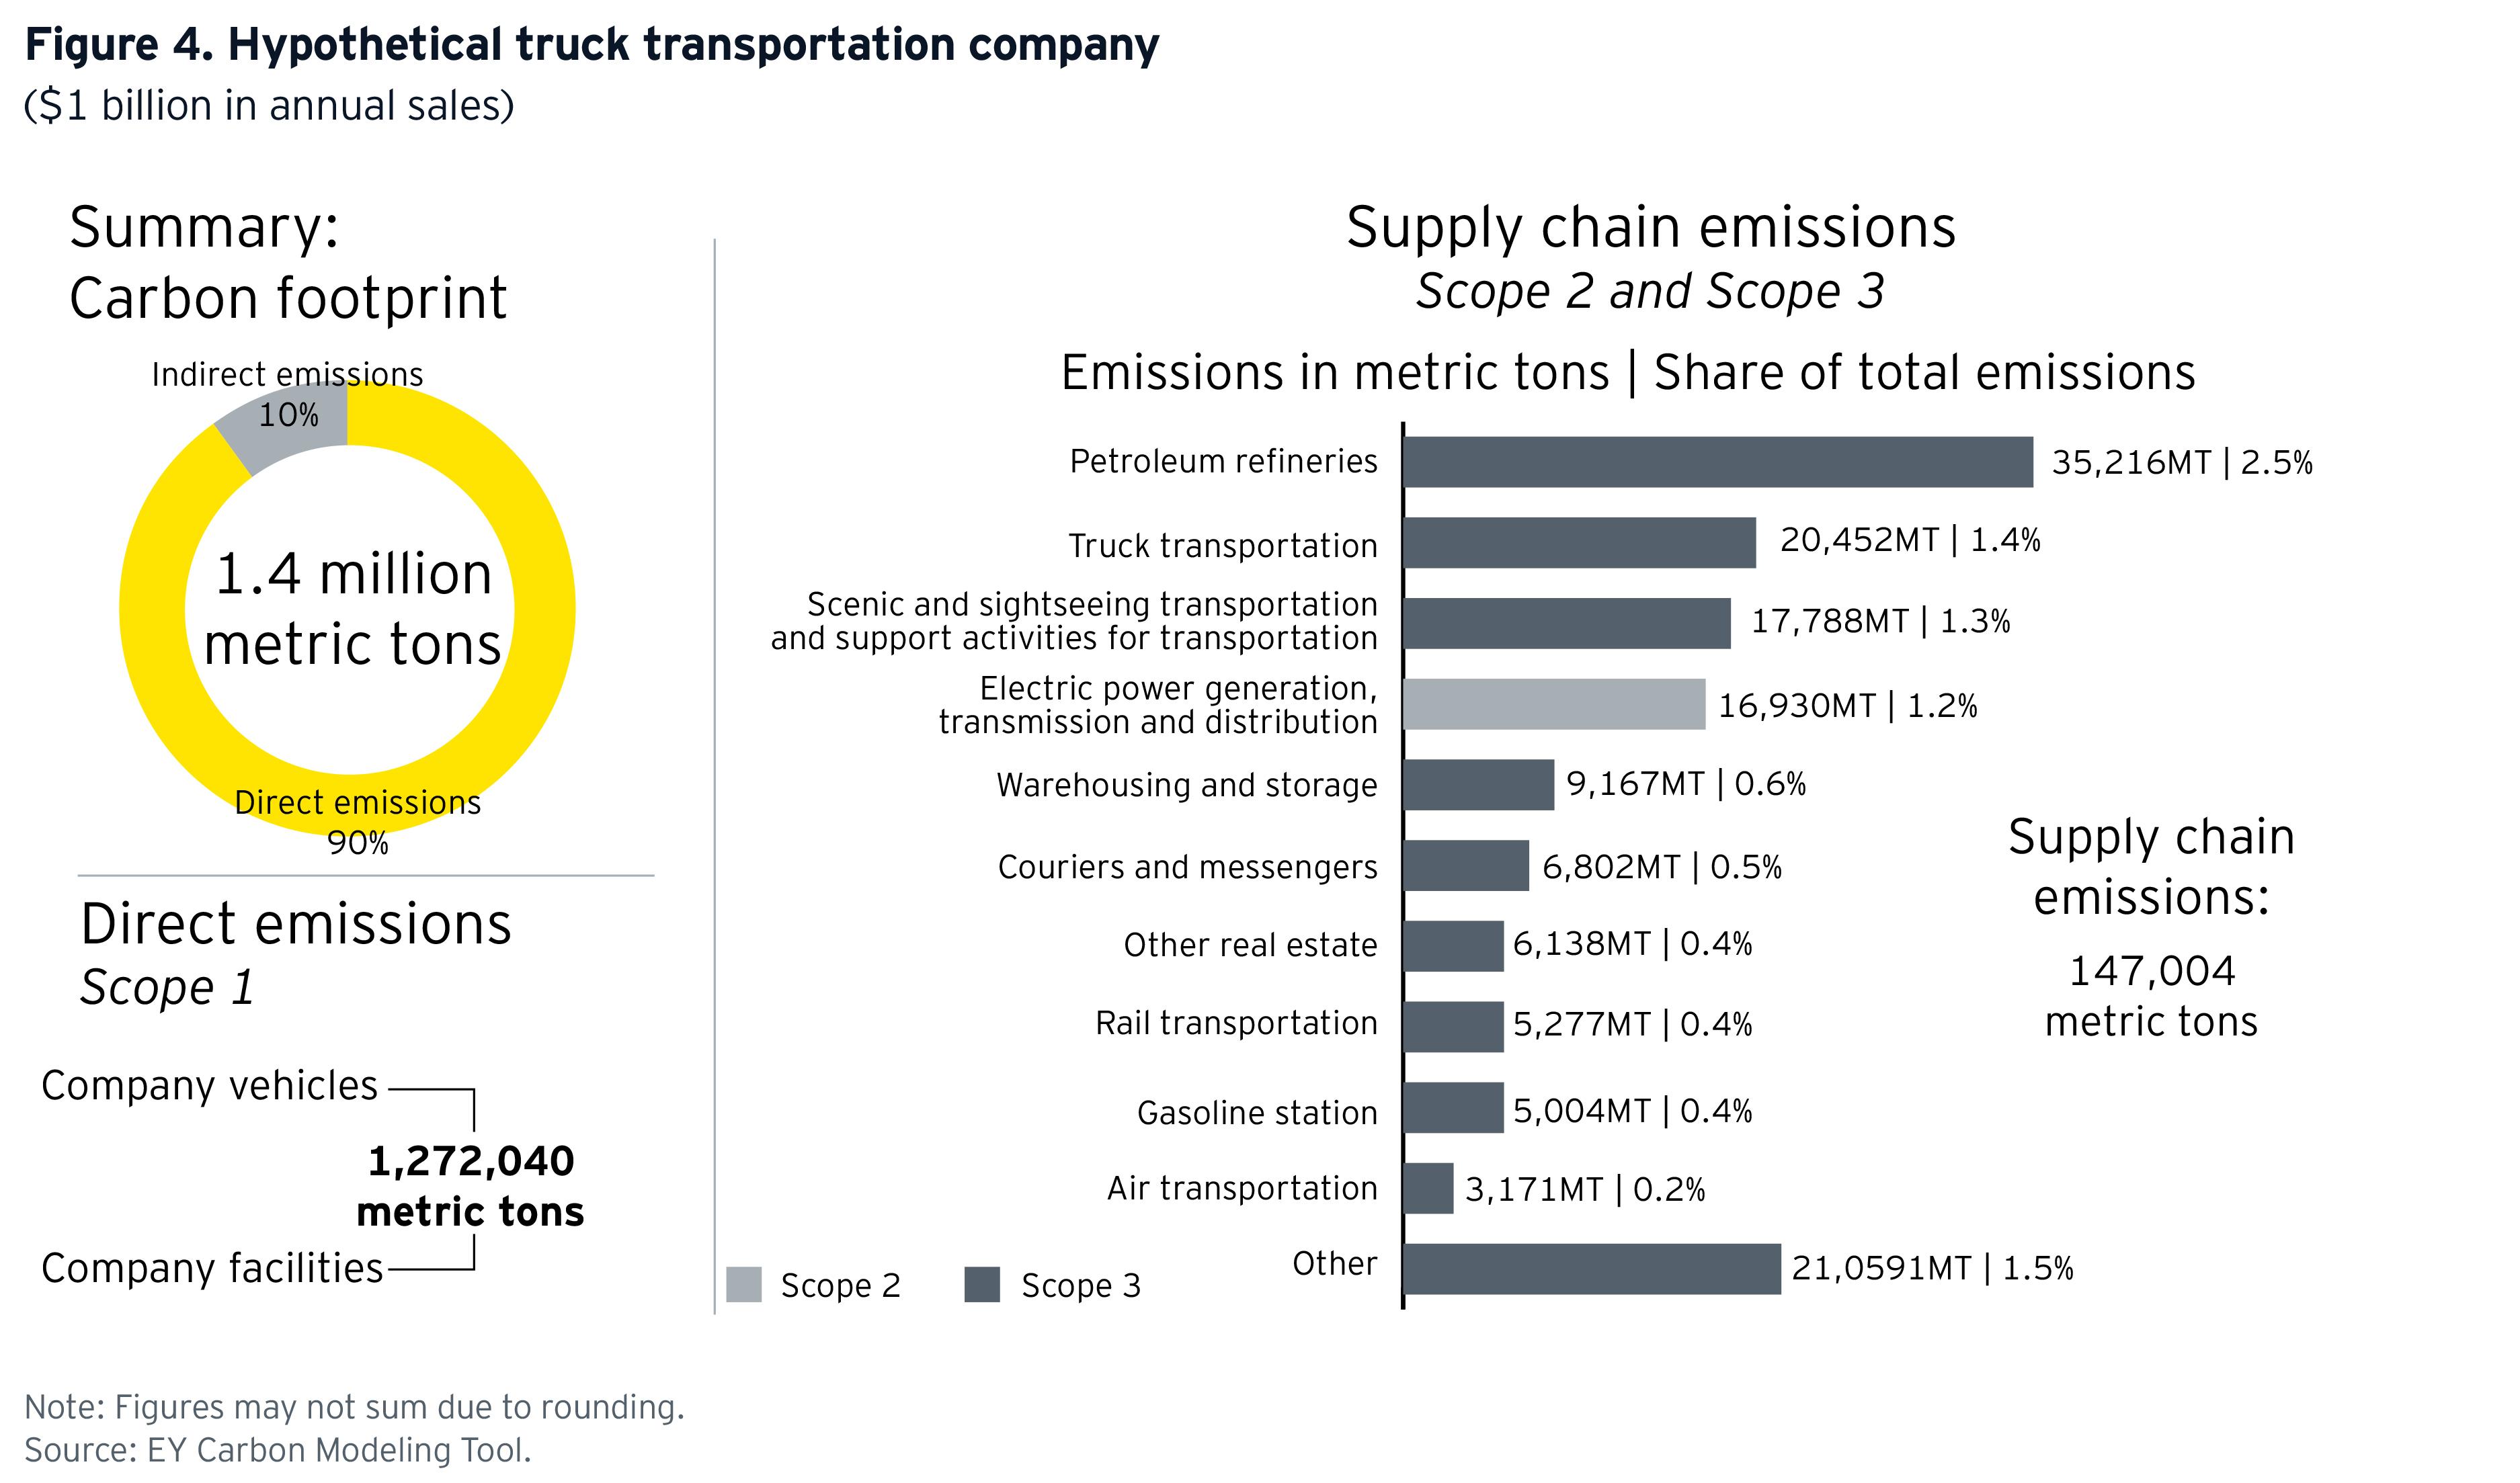 ey-hypothetical-truck-transportation-company